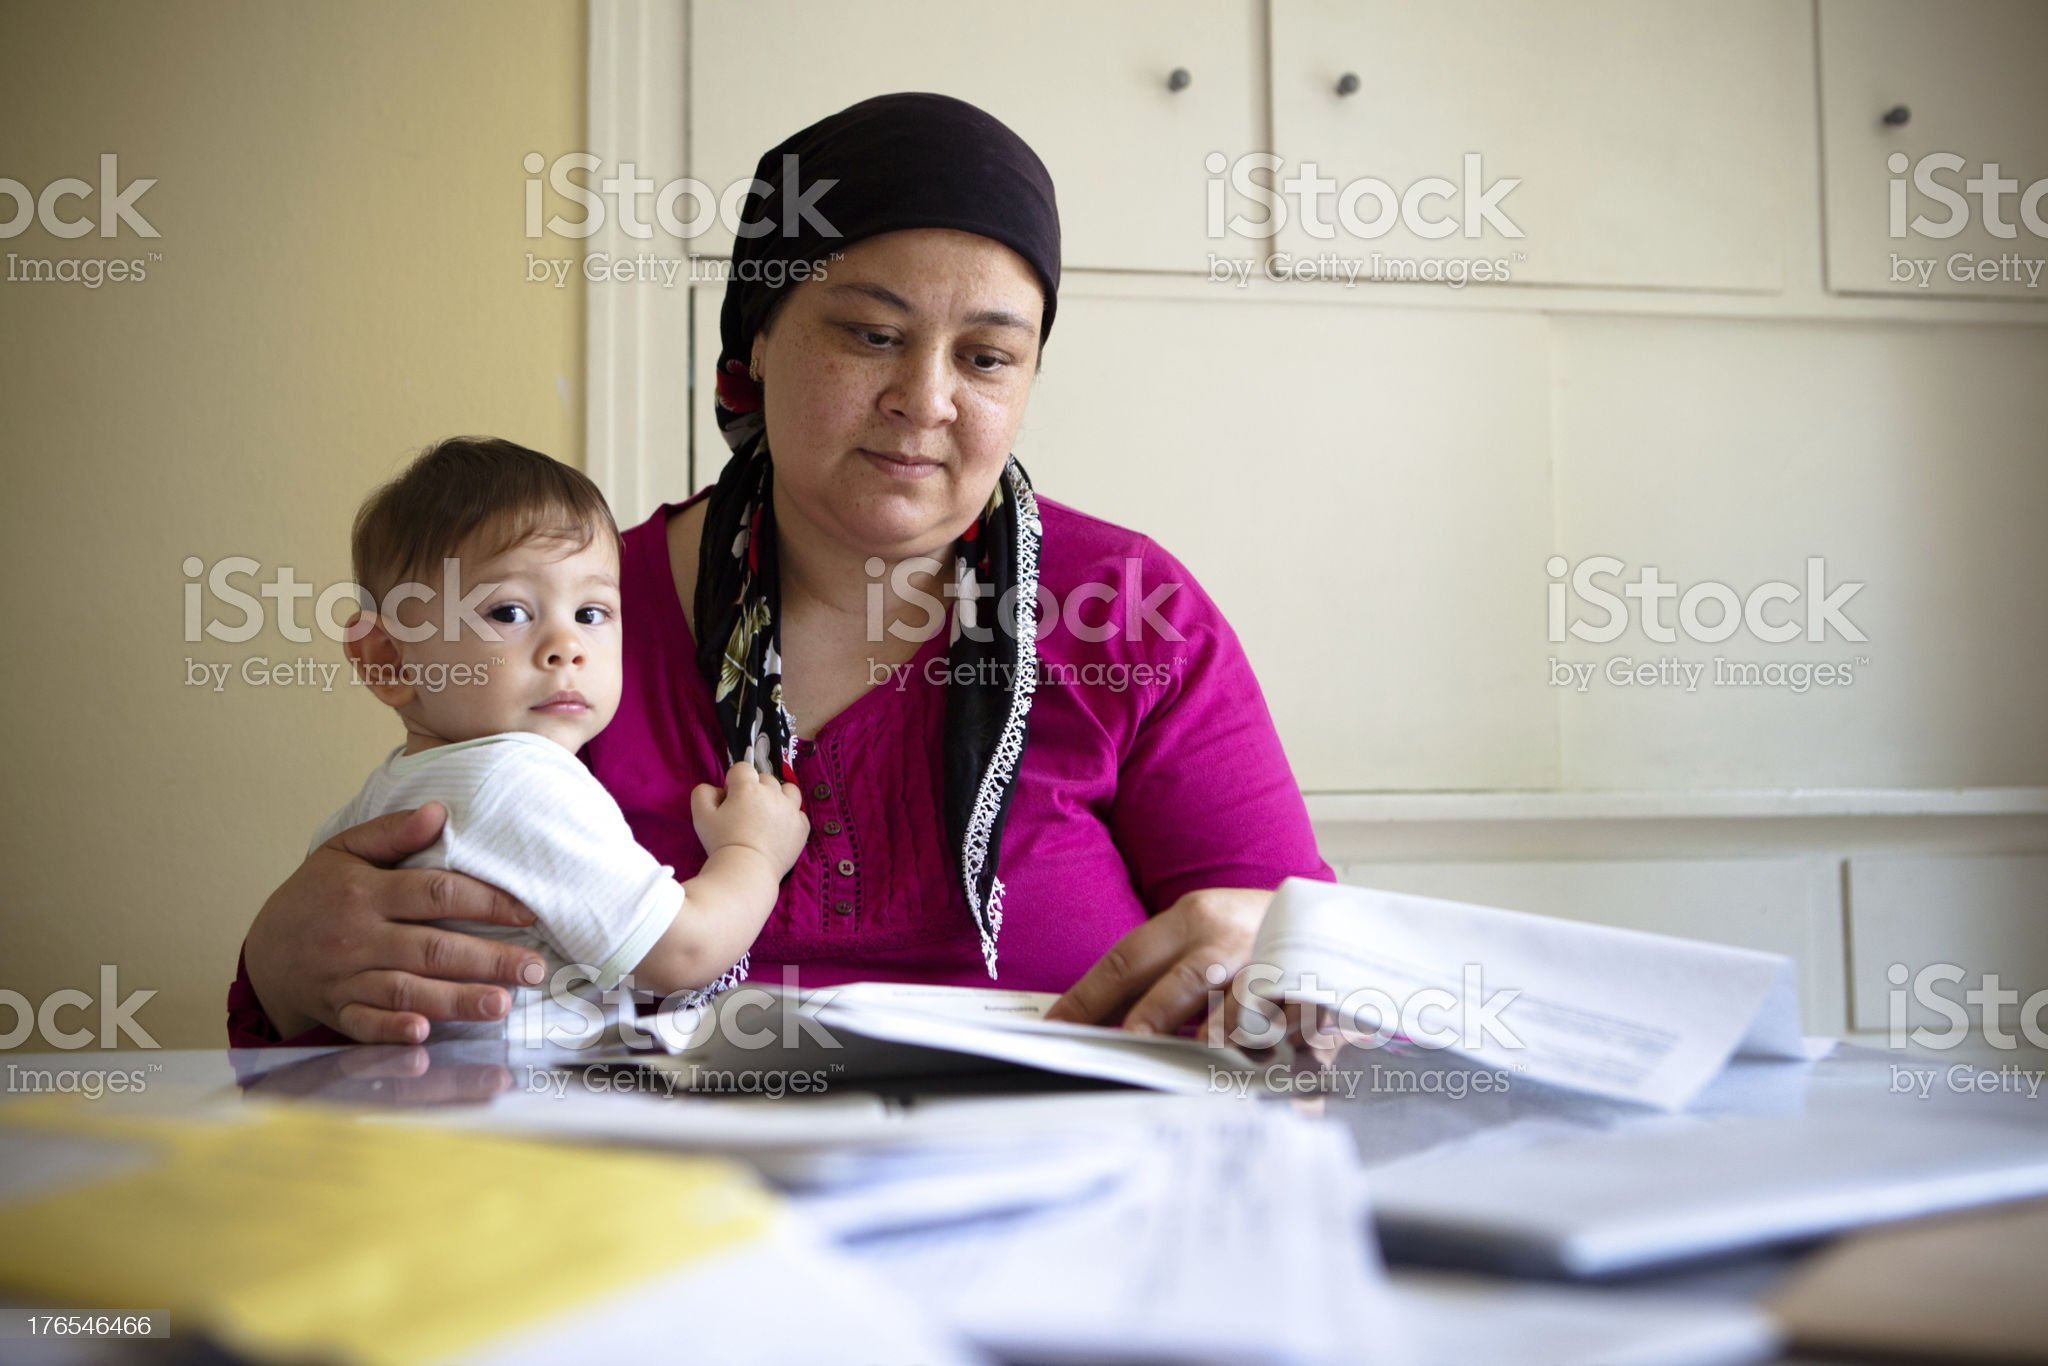 A Turkish woman sorting through paperwork looking helpless royalty-free stock photo